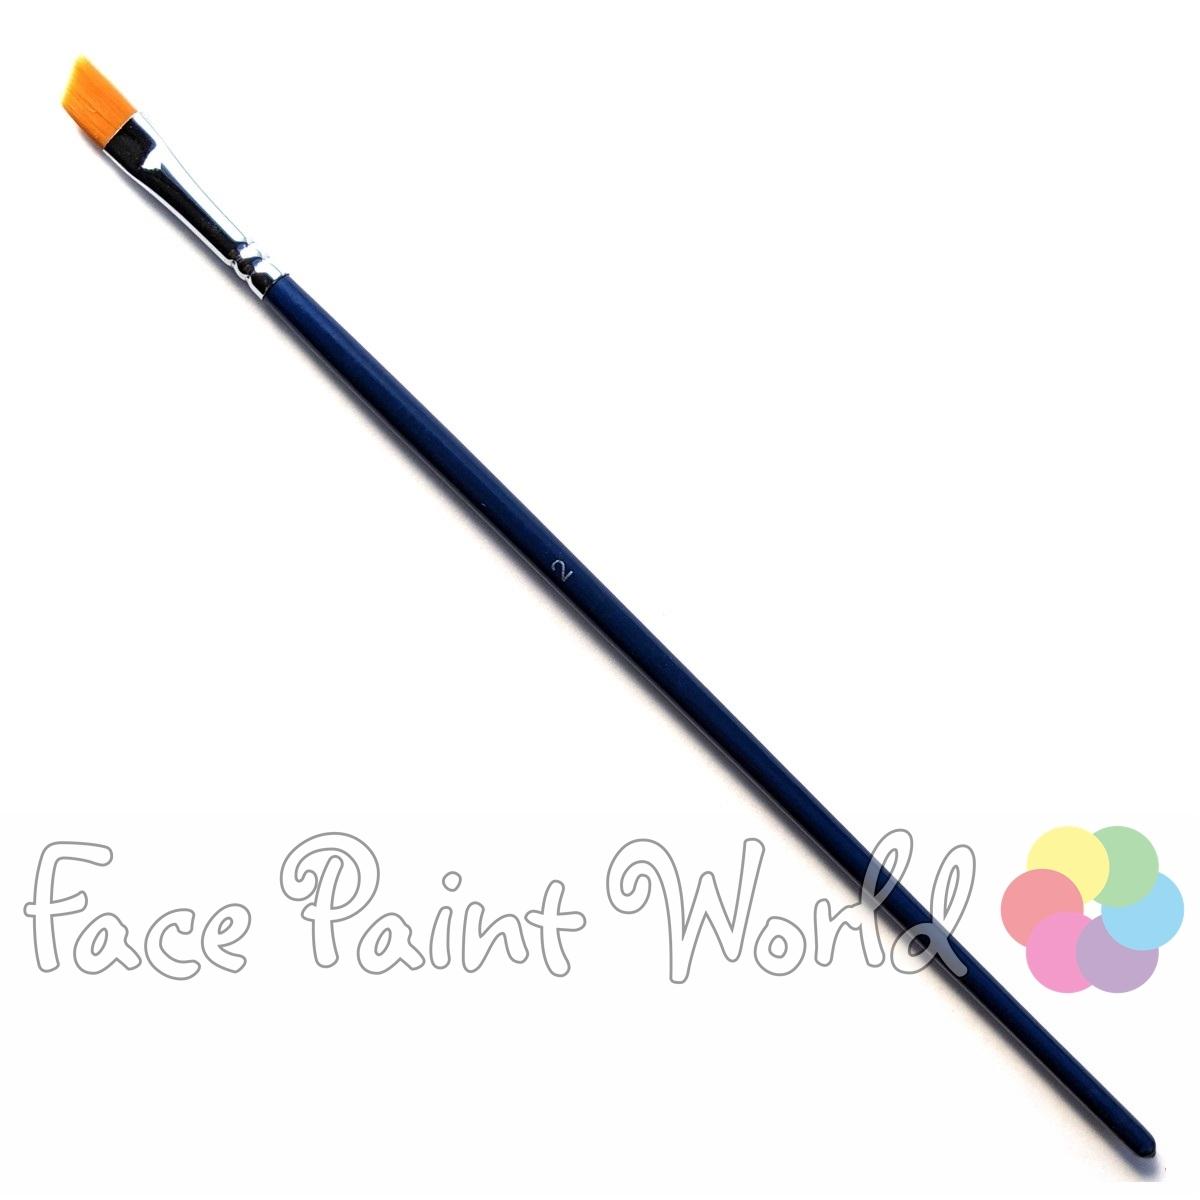 TAG Angular Shader Brush #02 : 1/4 inch